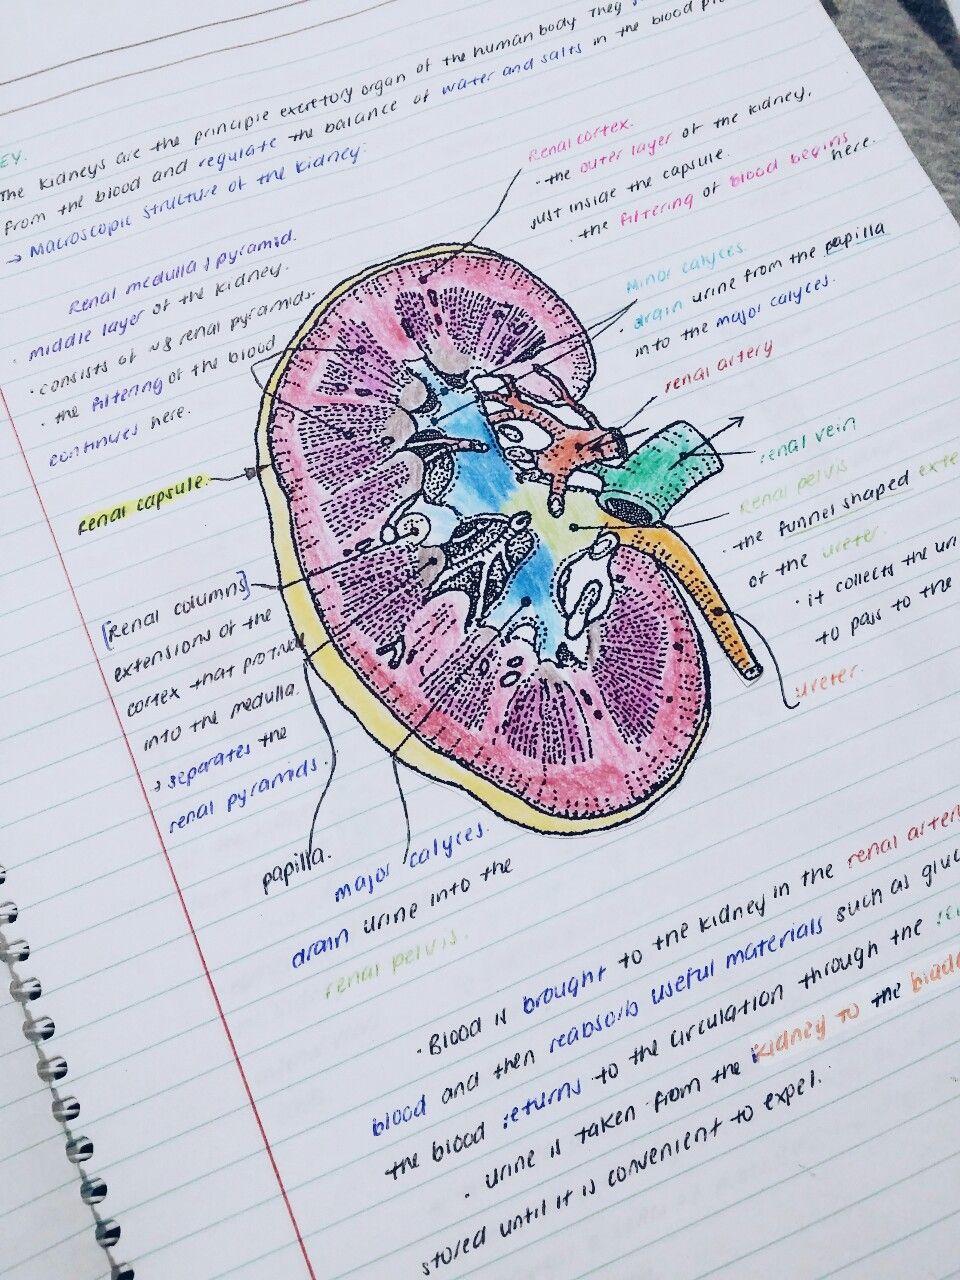 Anatomia Humana Rins | carobelen | Pinterest | Anatomía humana ...